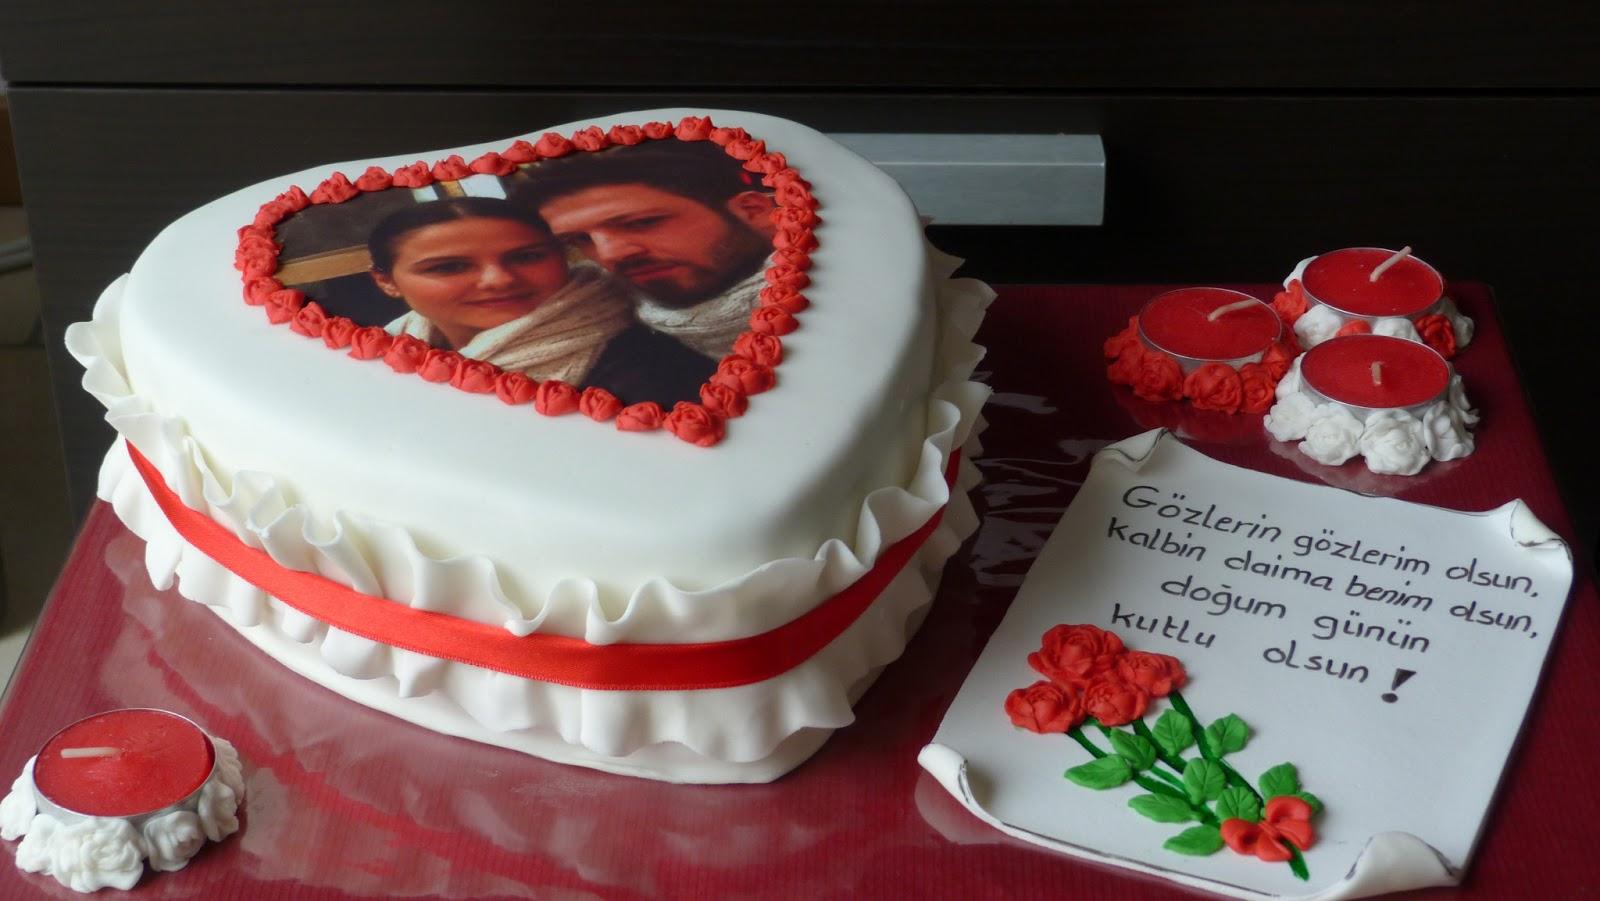 liefdes taart bestellen Cake Design by Pastanur: Foto taart / Resimli kalp pasta liefdes taart bestellen